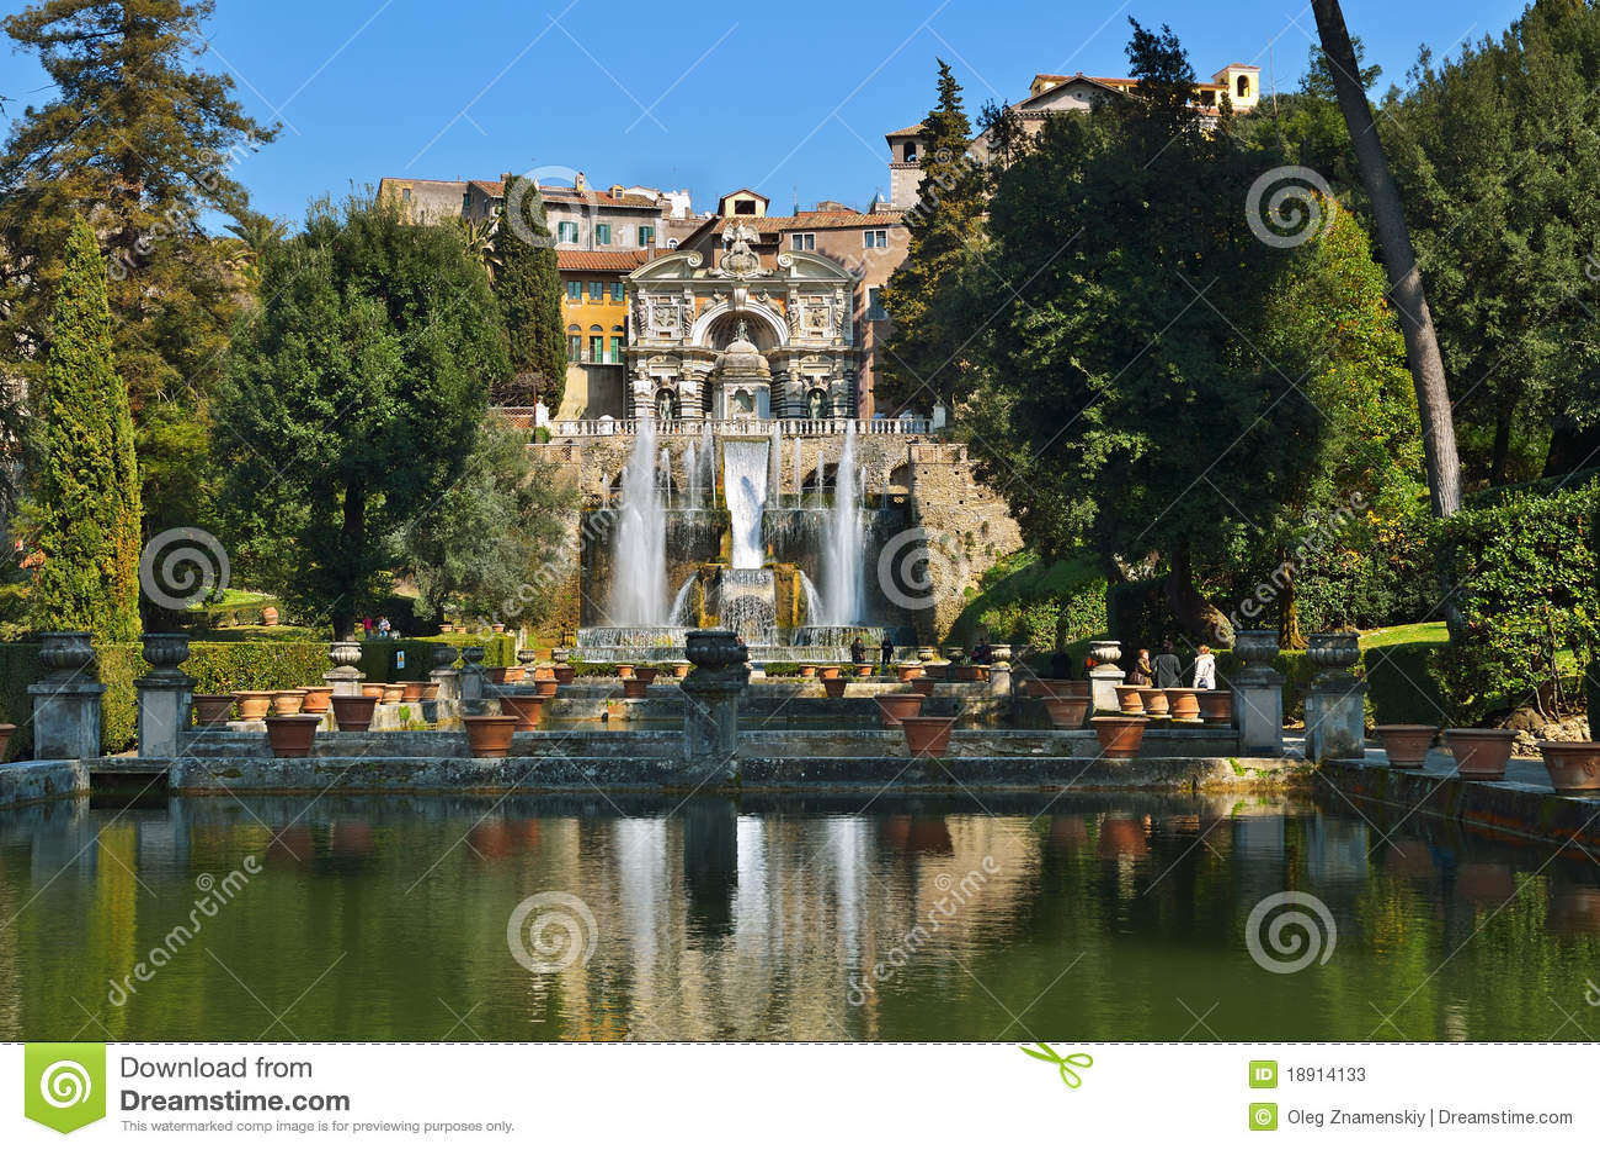 Tivoli italie jardin regroupement et fontaine image for Jardines tivoli zona 9